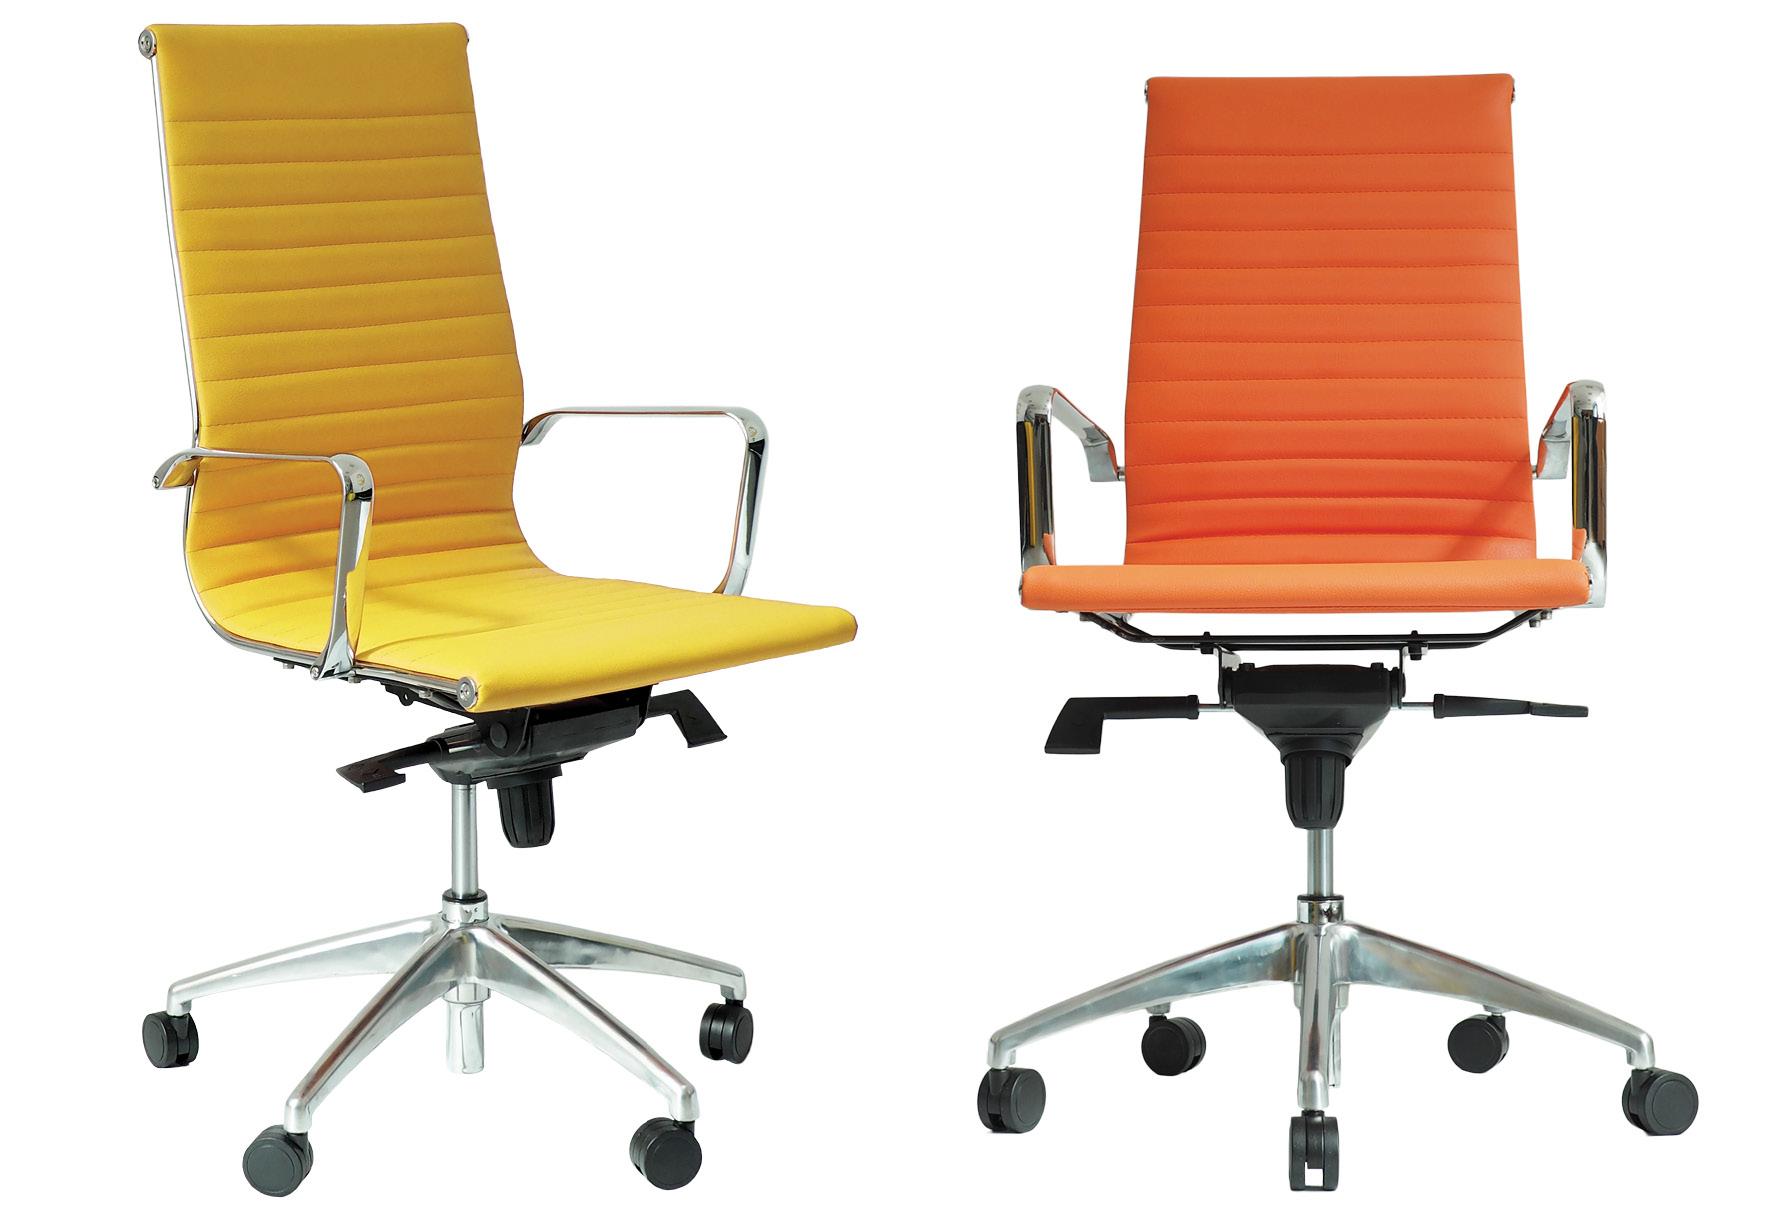 Silla ergon mica para oficina decoraoficina for Silla escolar ergonomica